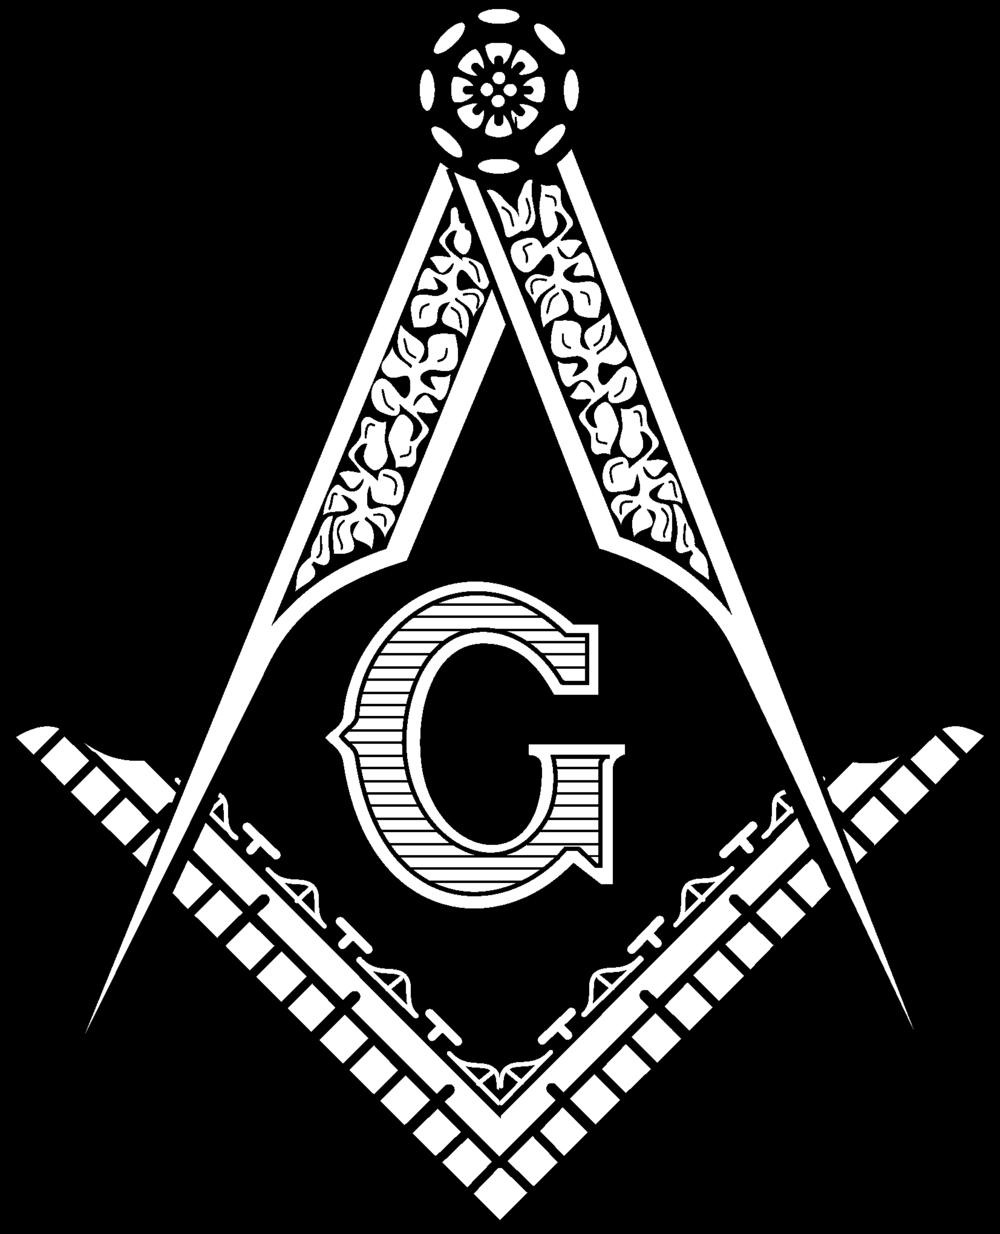 Political Conventions And Freemasonry Links To The Sad Morgan